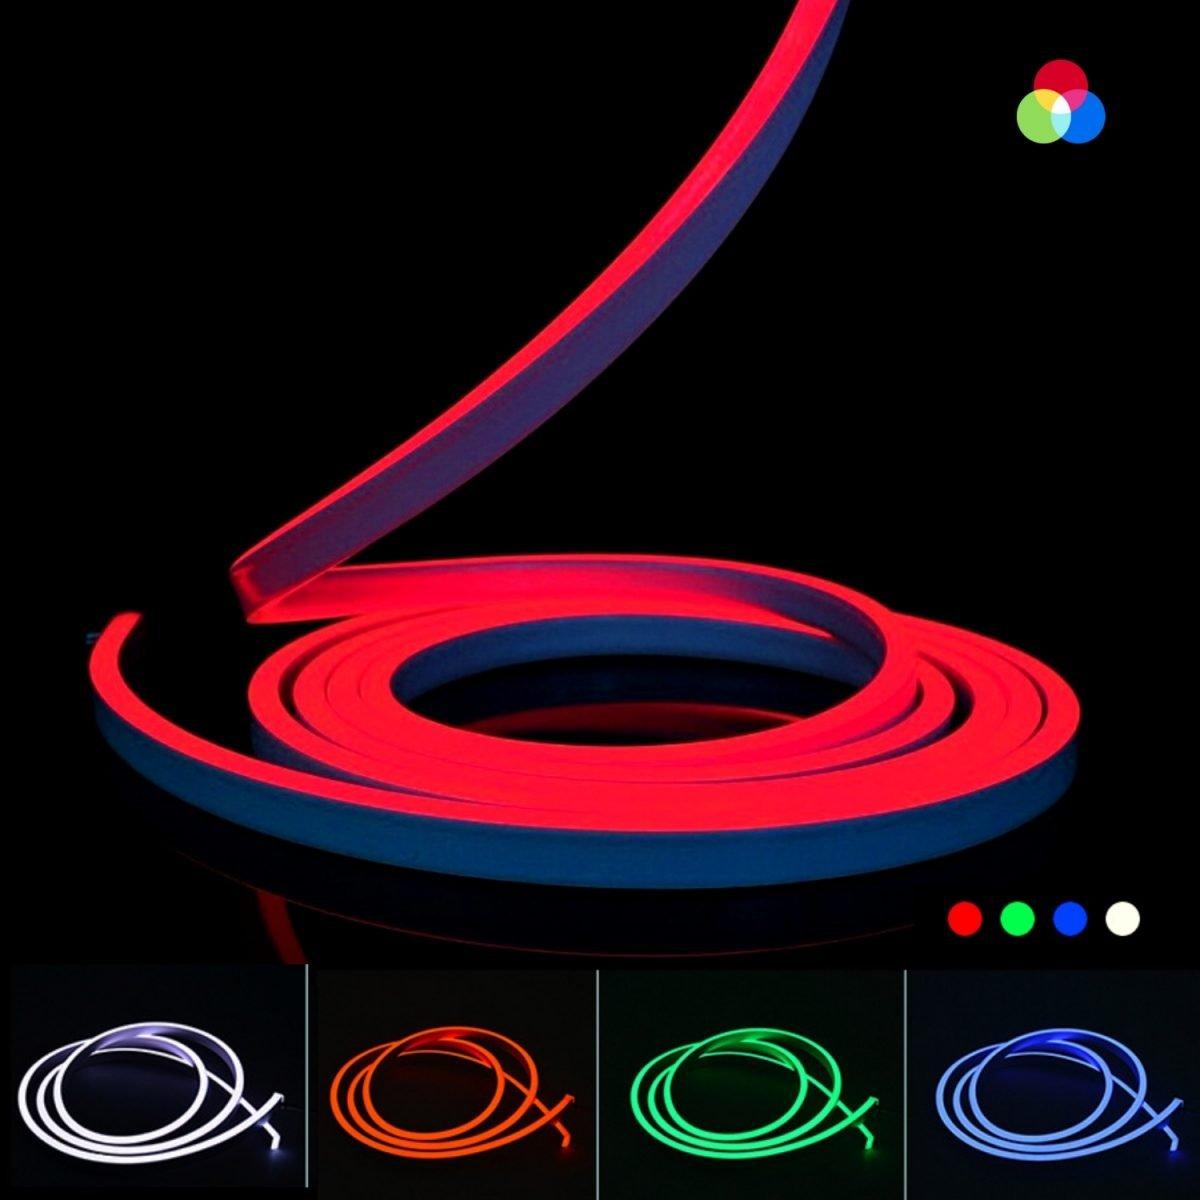 ATOM LED RGB NEON FLEX 24V 10x20mm WITH WIRELESS BLUETOOTH CONTROLLER & APP (1)